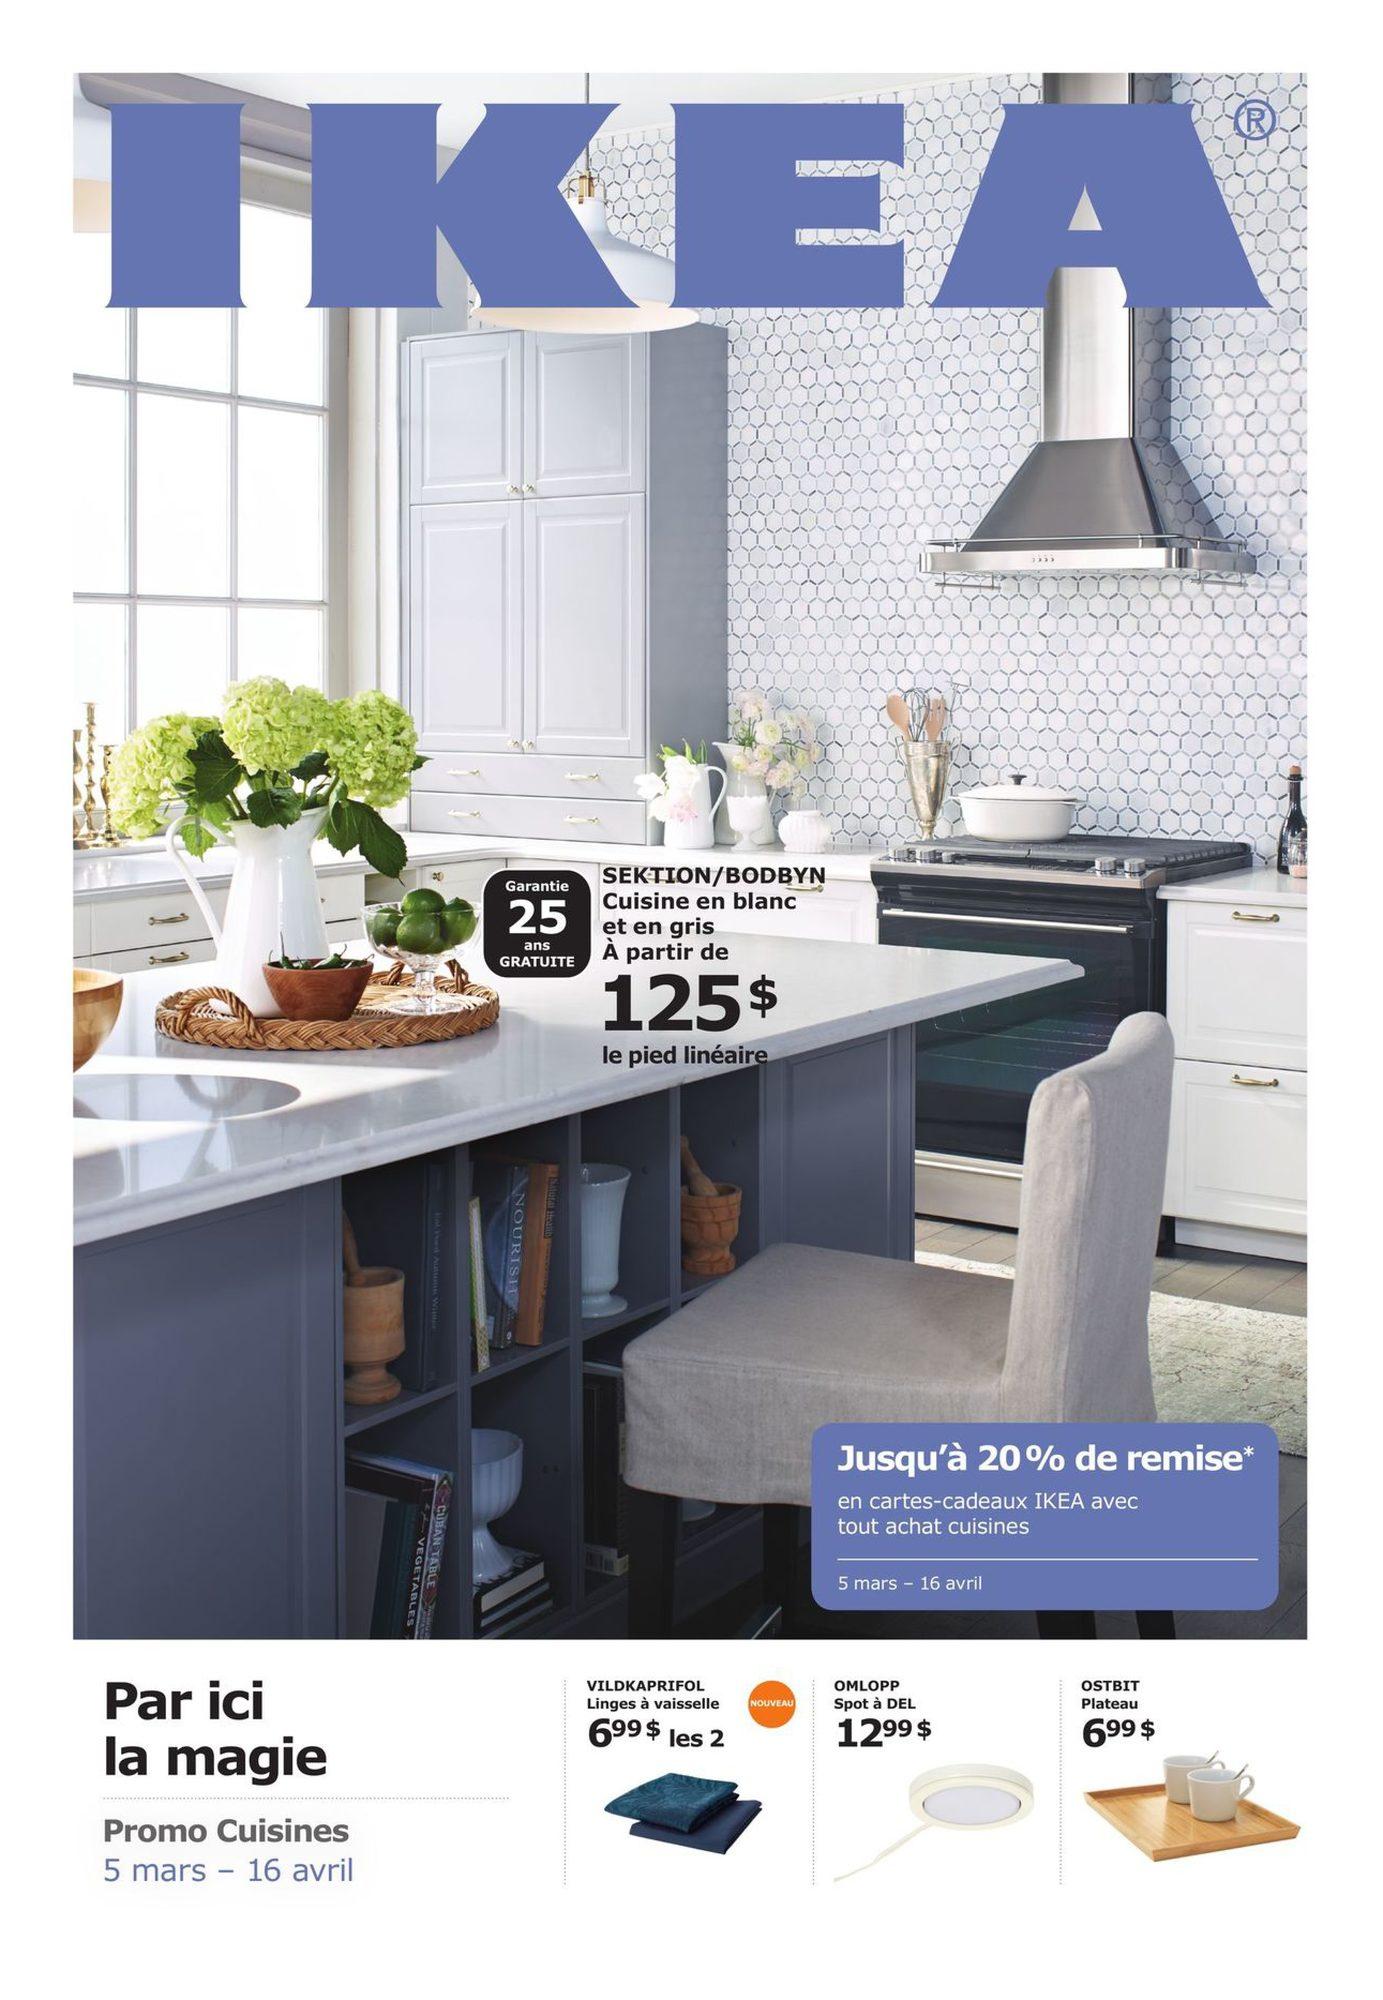 Promo Cuisines Ikea 5 Mars 2018 Pj Shopwise